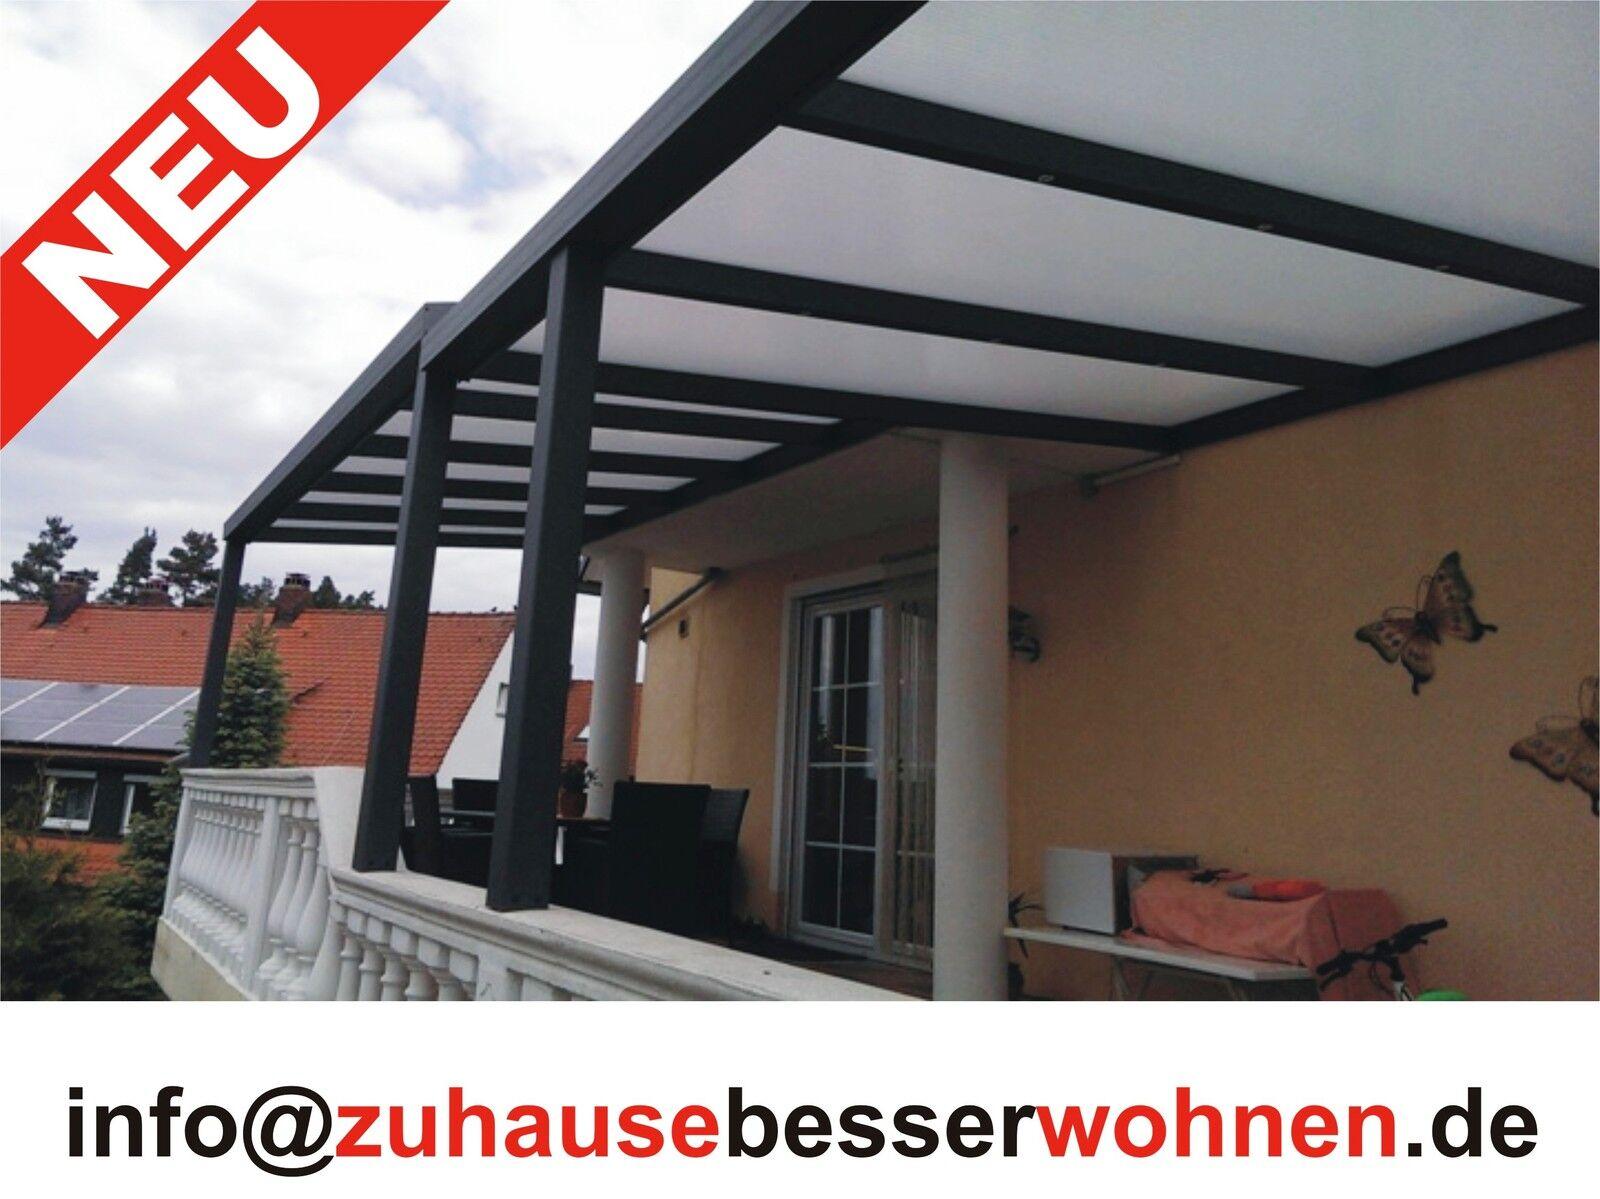 terrassen berdachung carport berdachung aluminium terrassendach vsg glas 4x3 5 eur. Black Bedroom Furniture Sets. Home Design Ideas